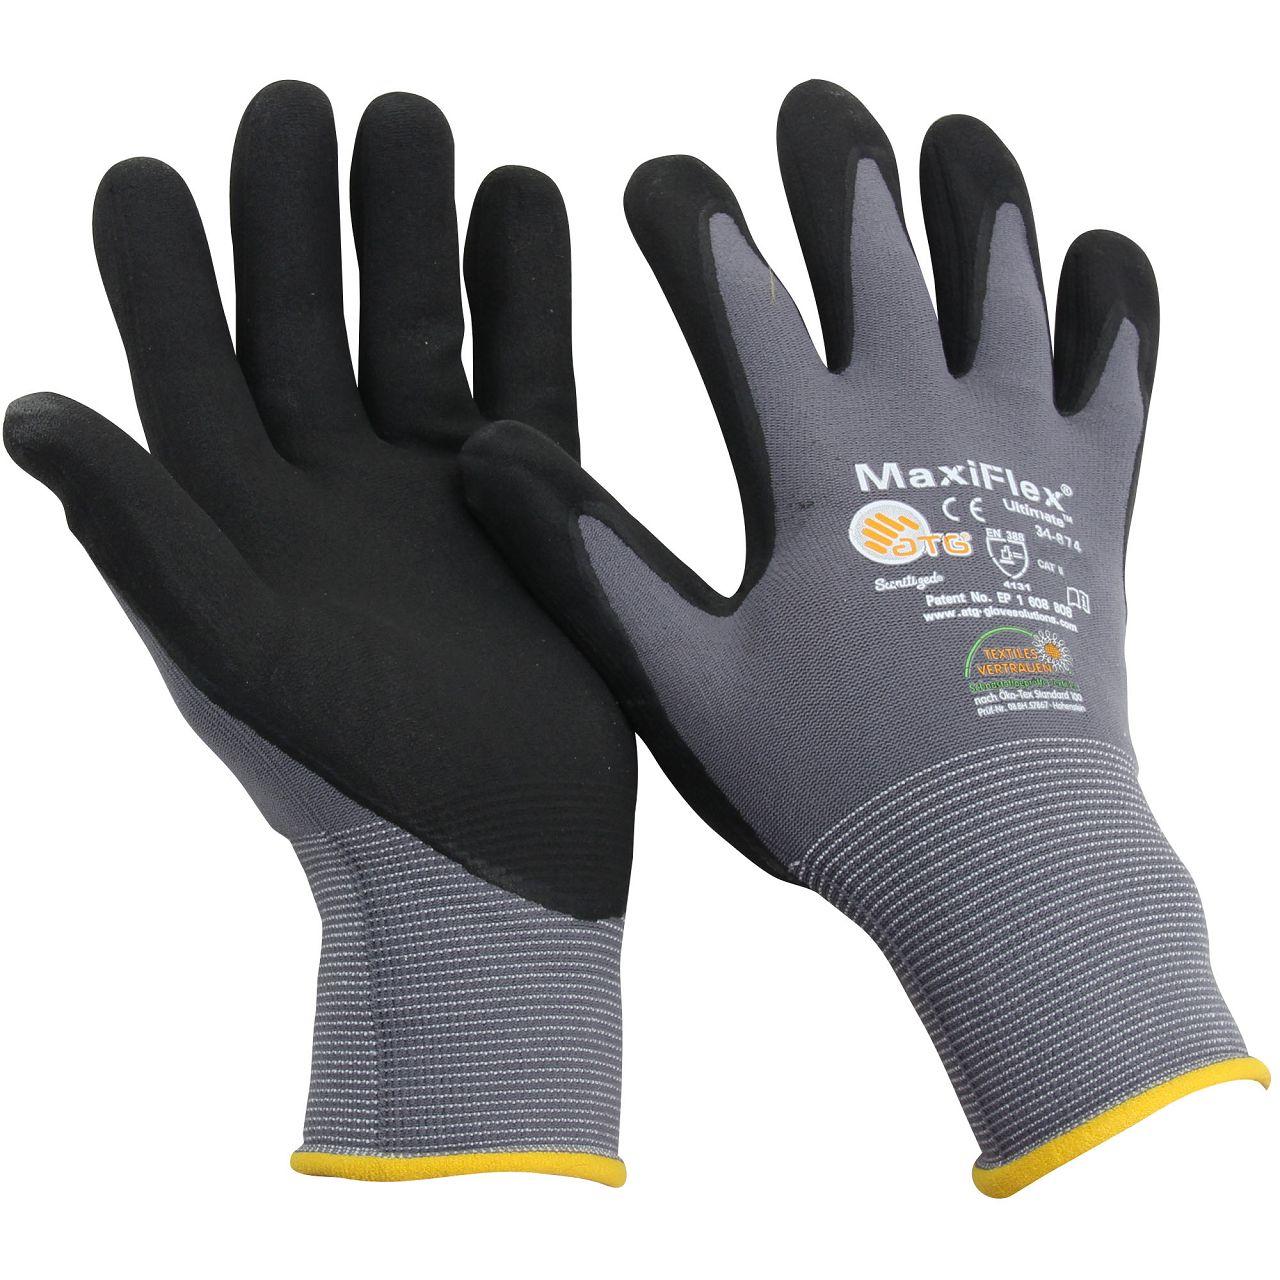 MAXIFLEX Ultimate ATG Texxor Handschuhe Arbeitshandschuhe Größe 9 / L (1 Paar)